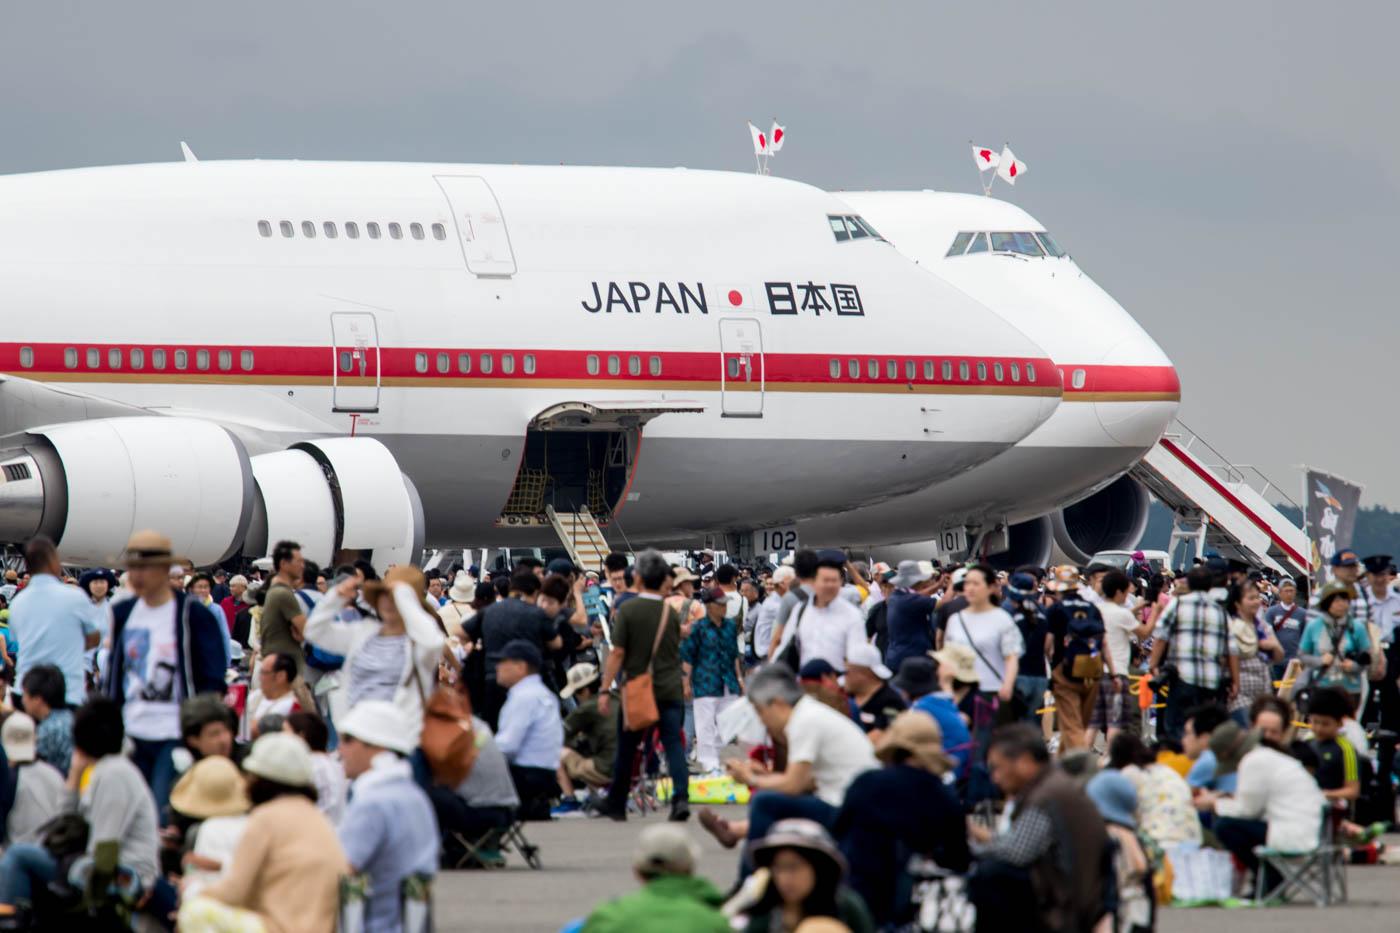 JASDF 747 at Chitose Air Festival